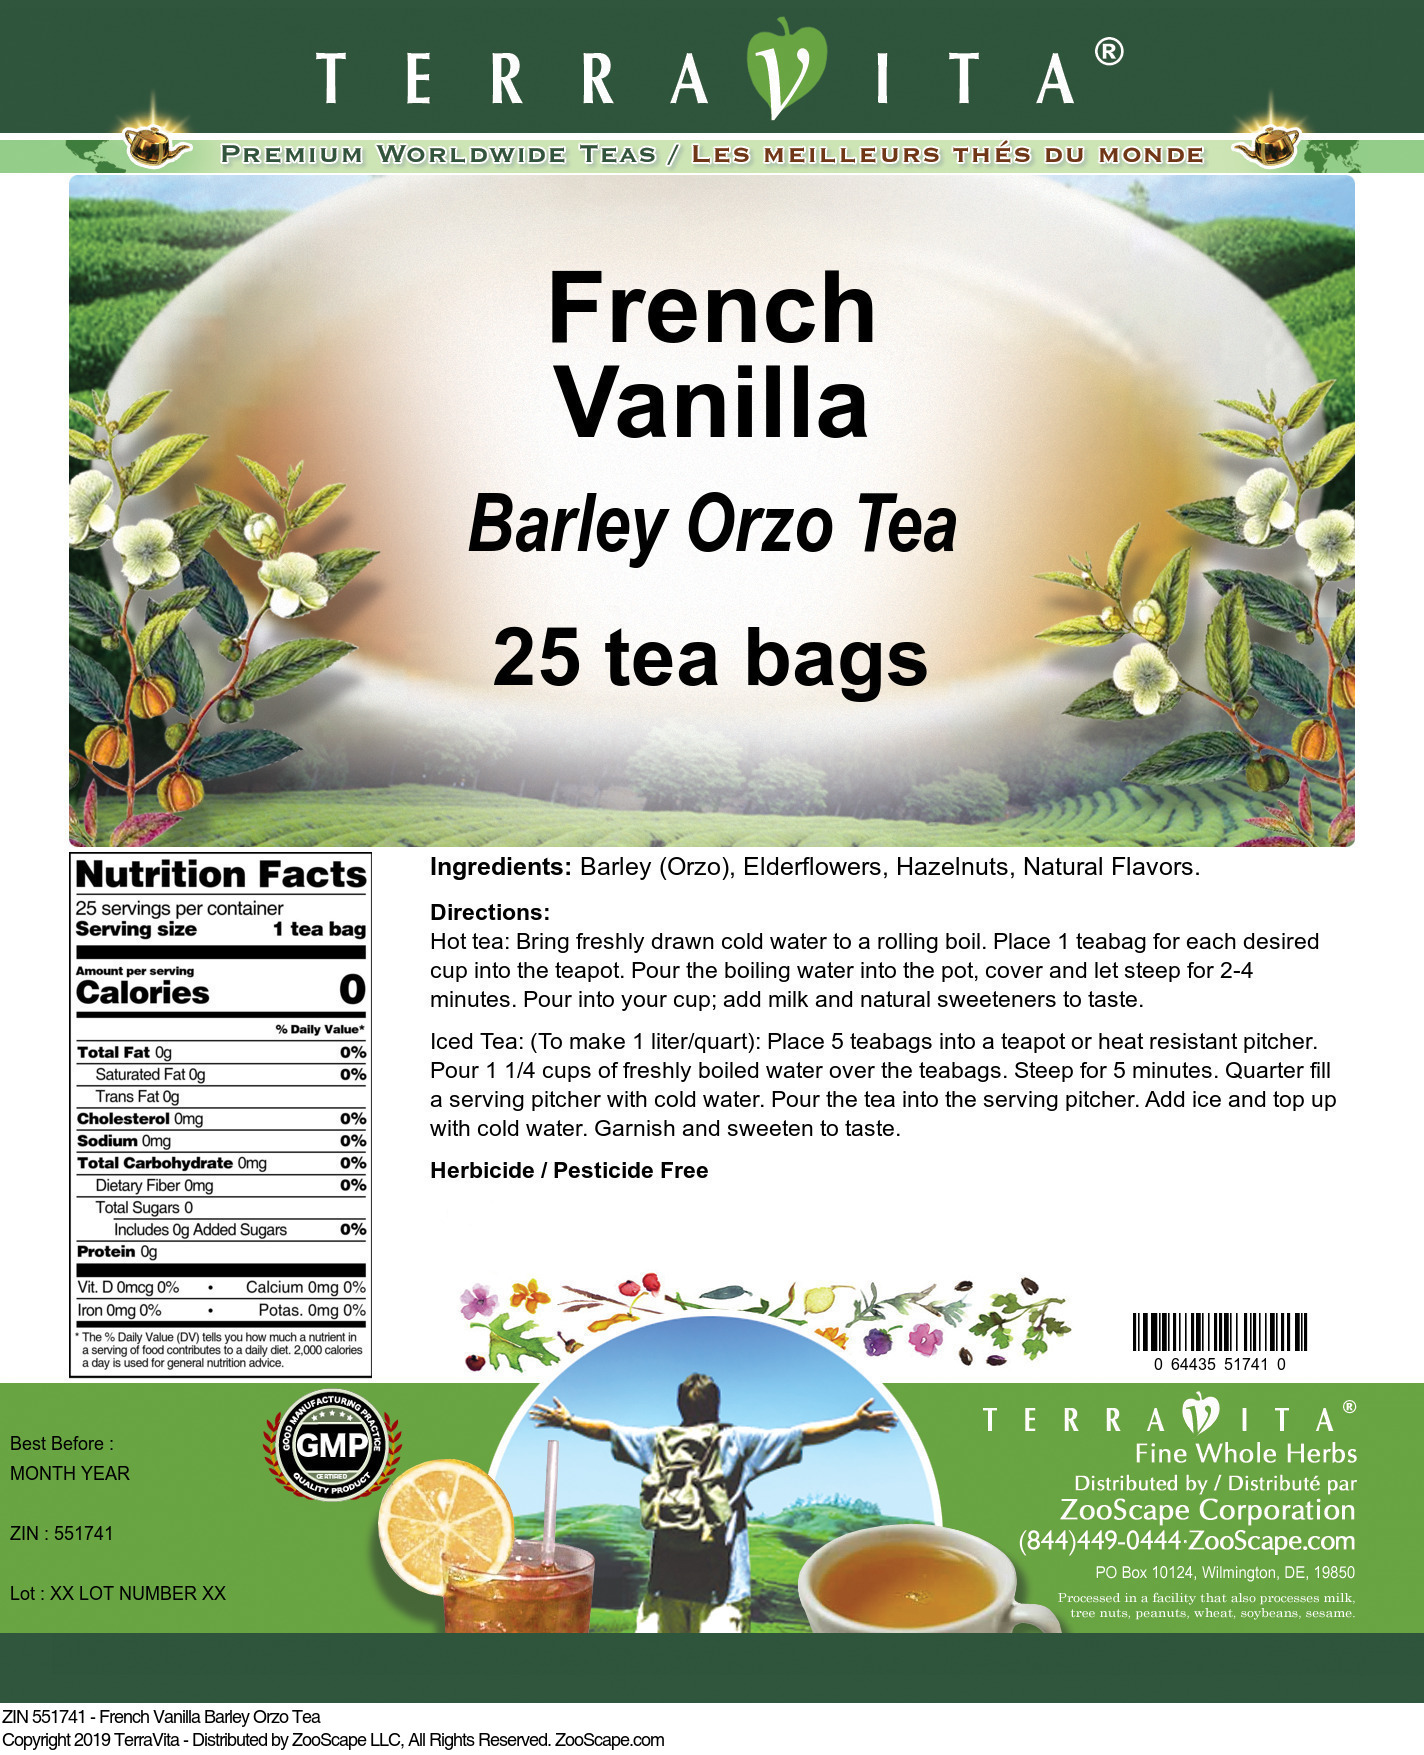 French Vanilla Barley Orzo Tea